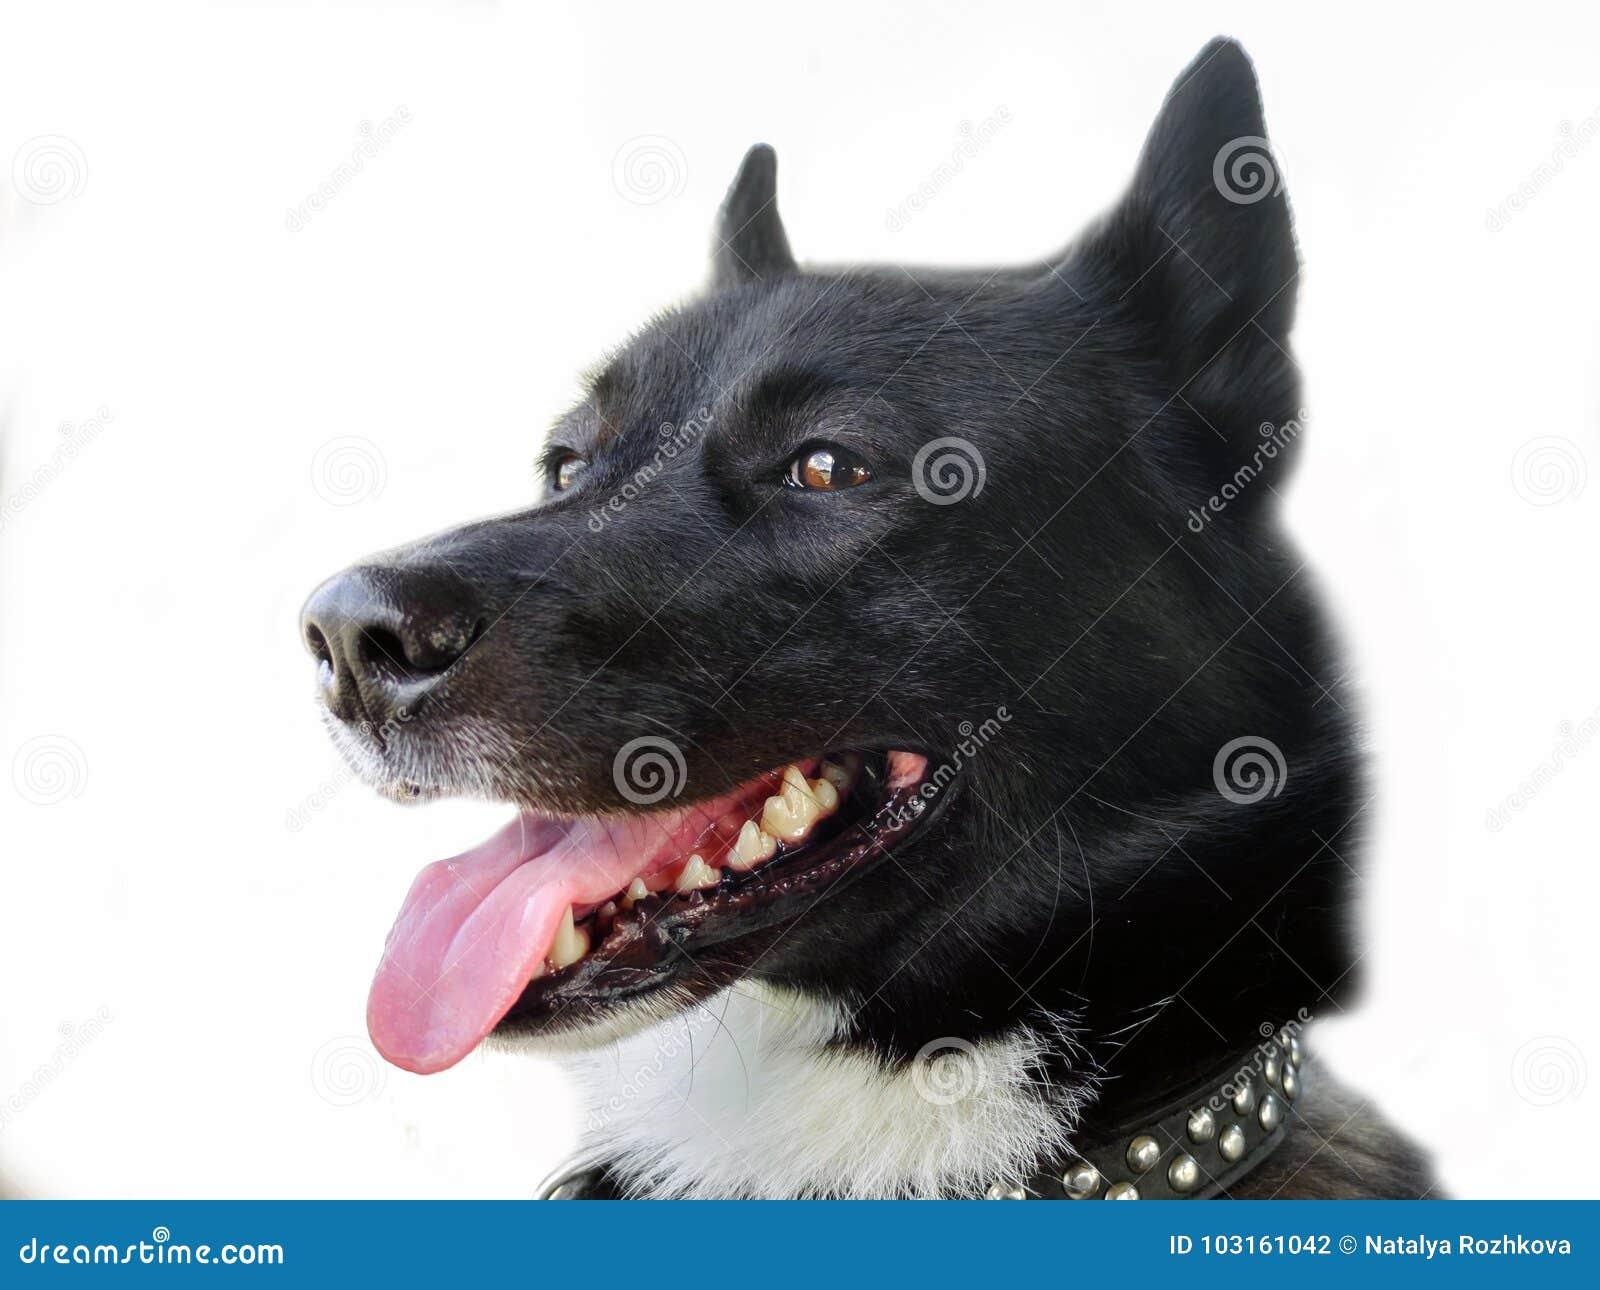 The dog`s laika look.